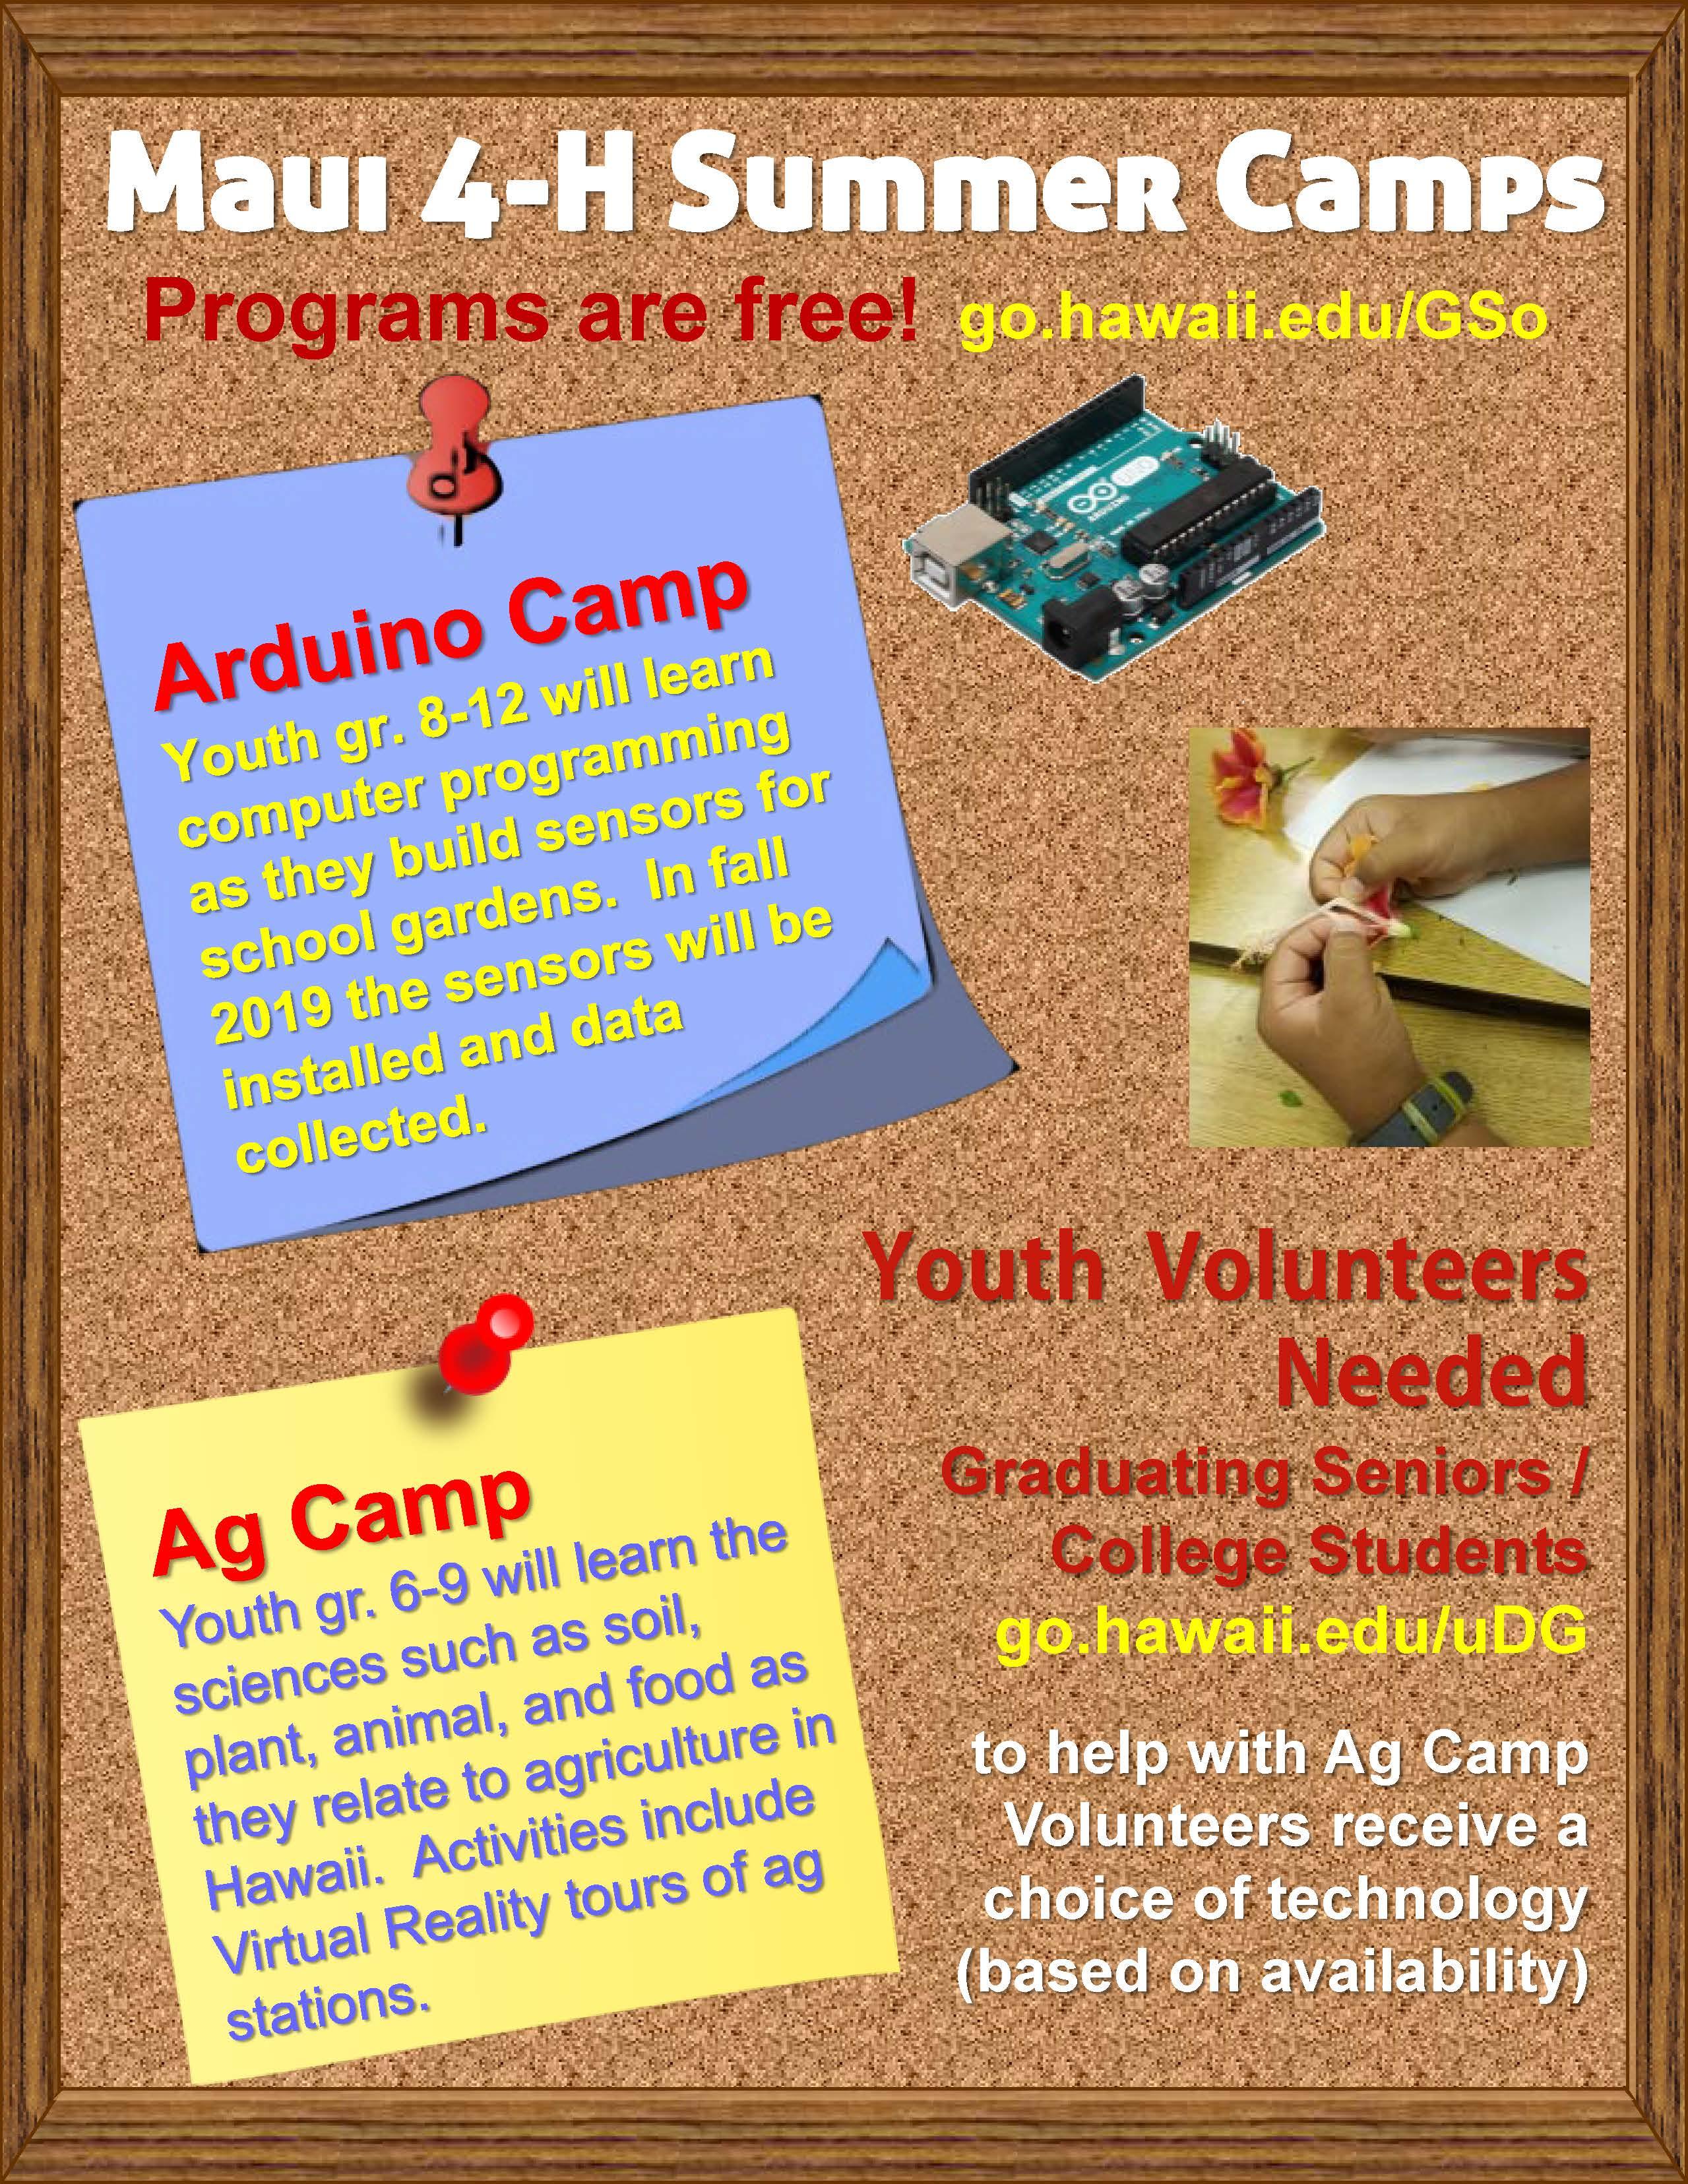 Flyer outlining summer camp programs